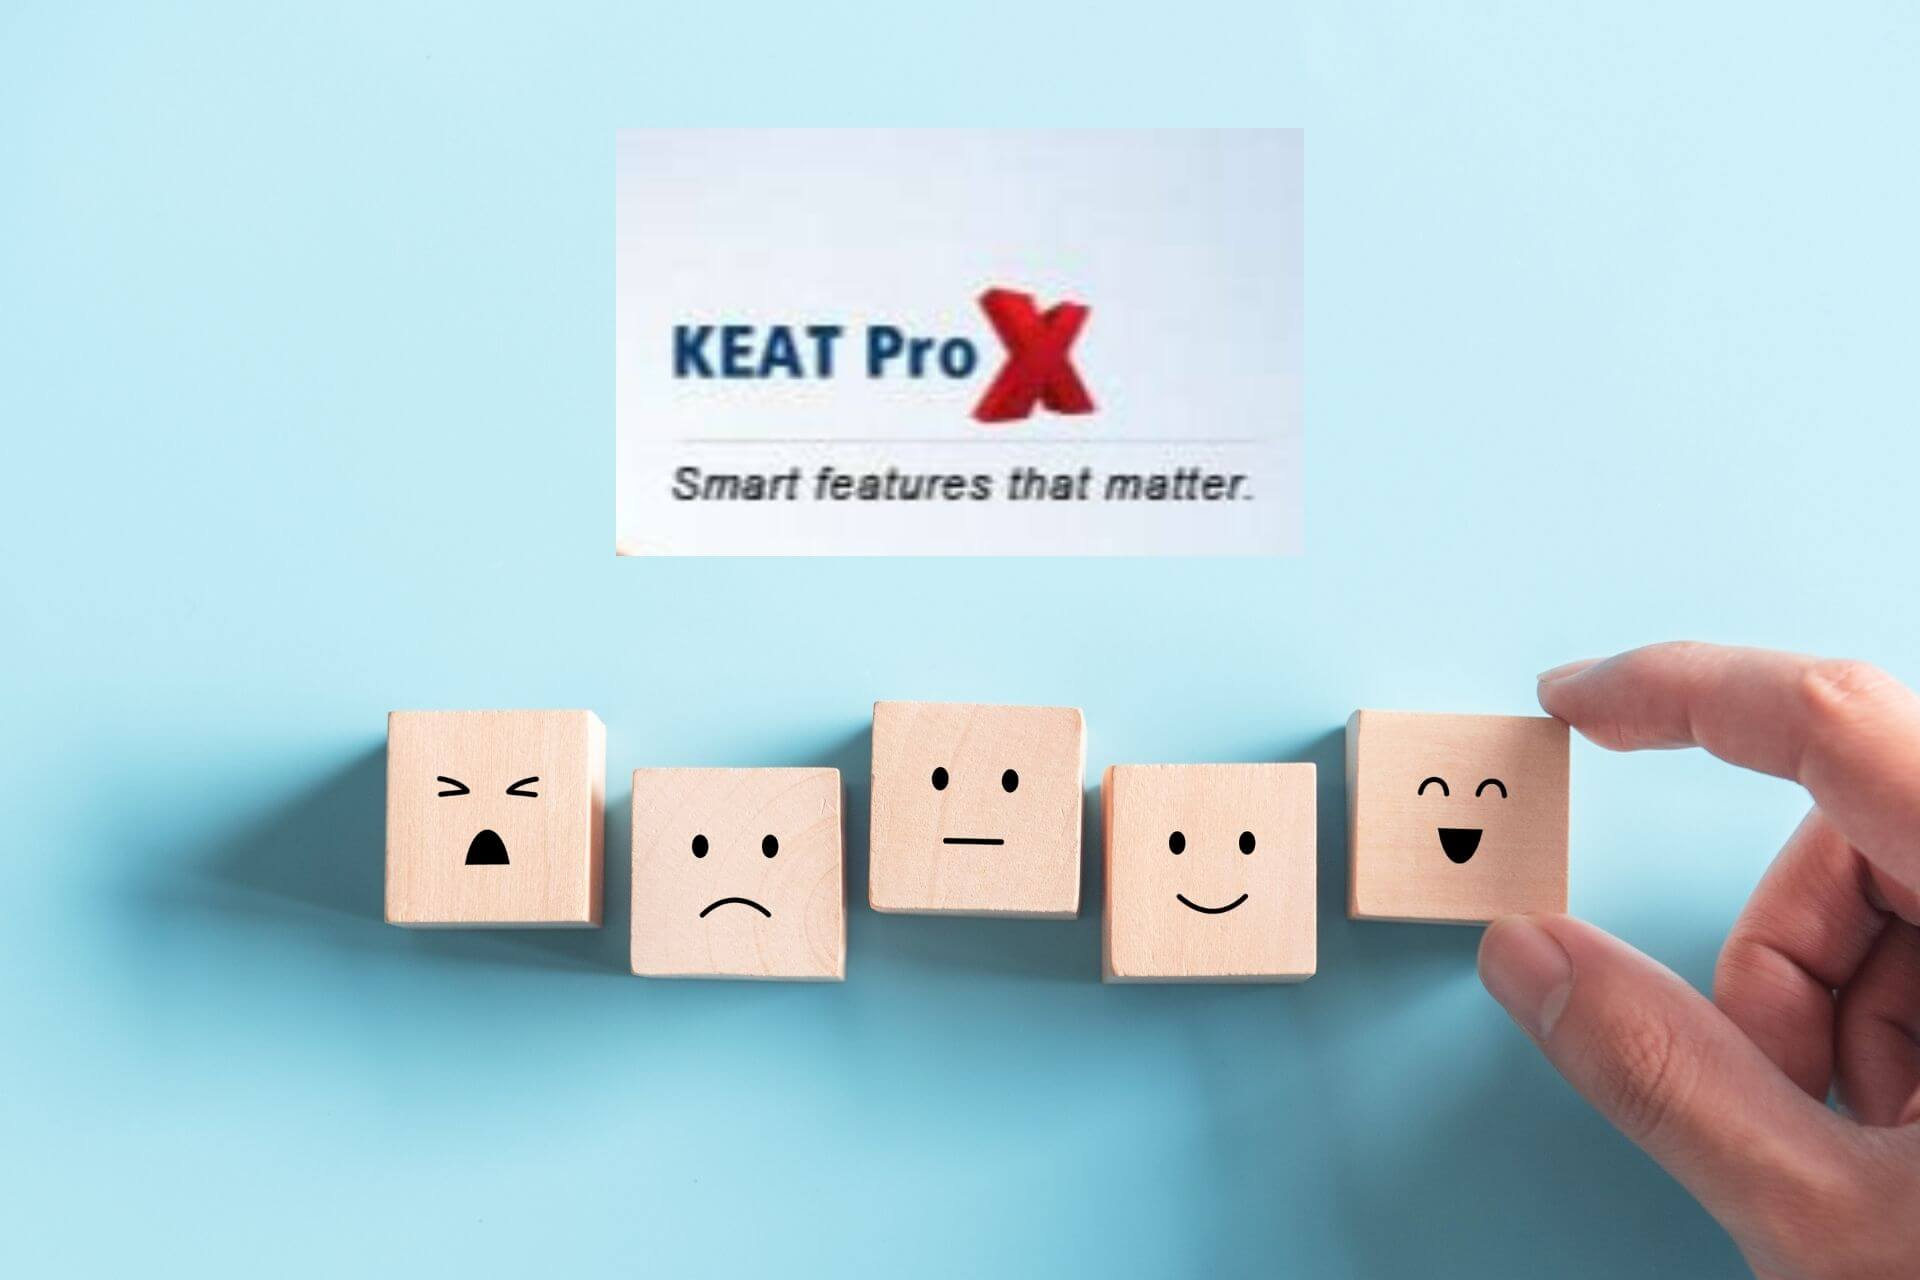 Kotak KEAT Pro X Review 2021 – Features, Setup Process & Benefits